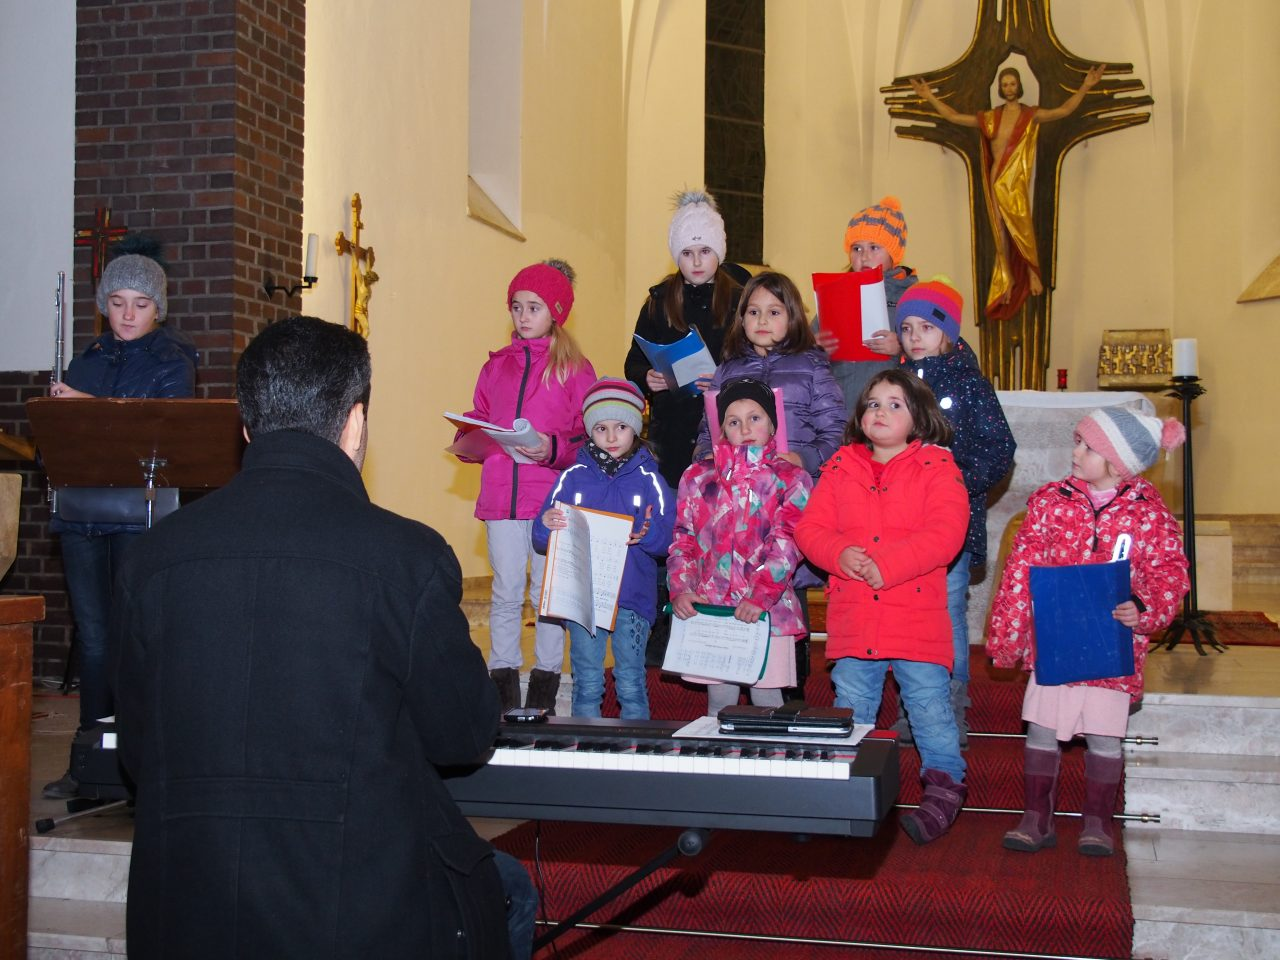 Kinderchor Hl. Geist / St. Michael